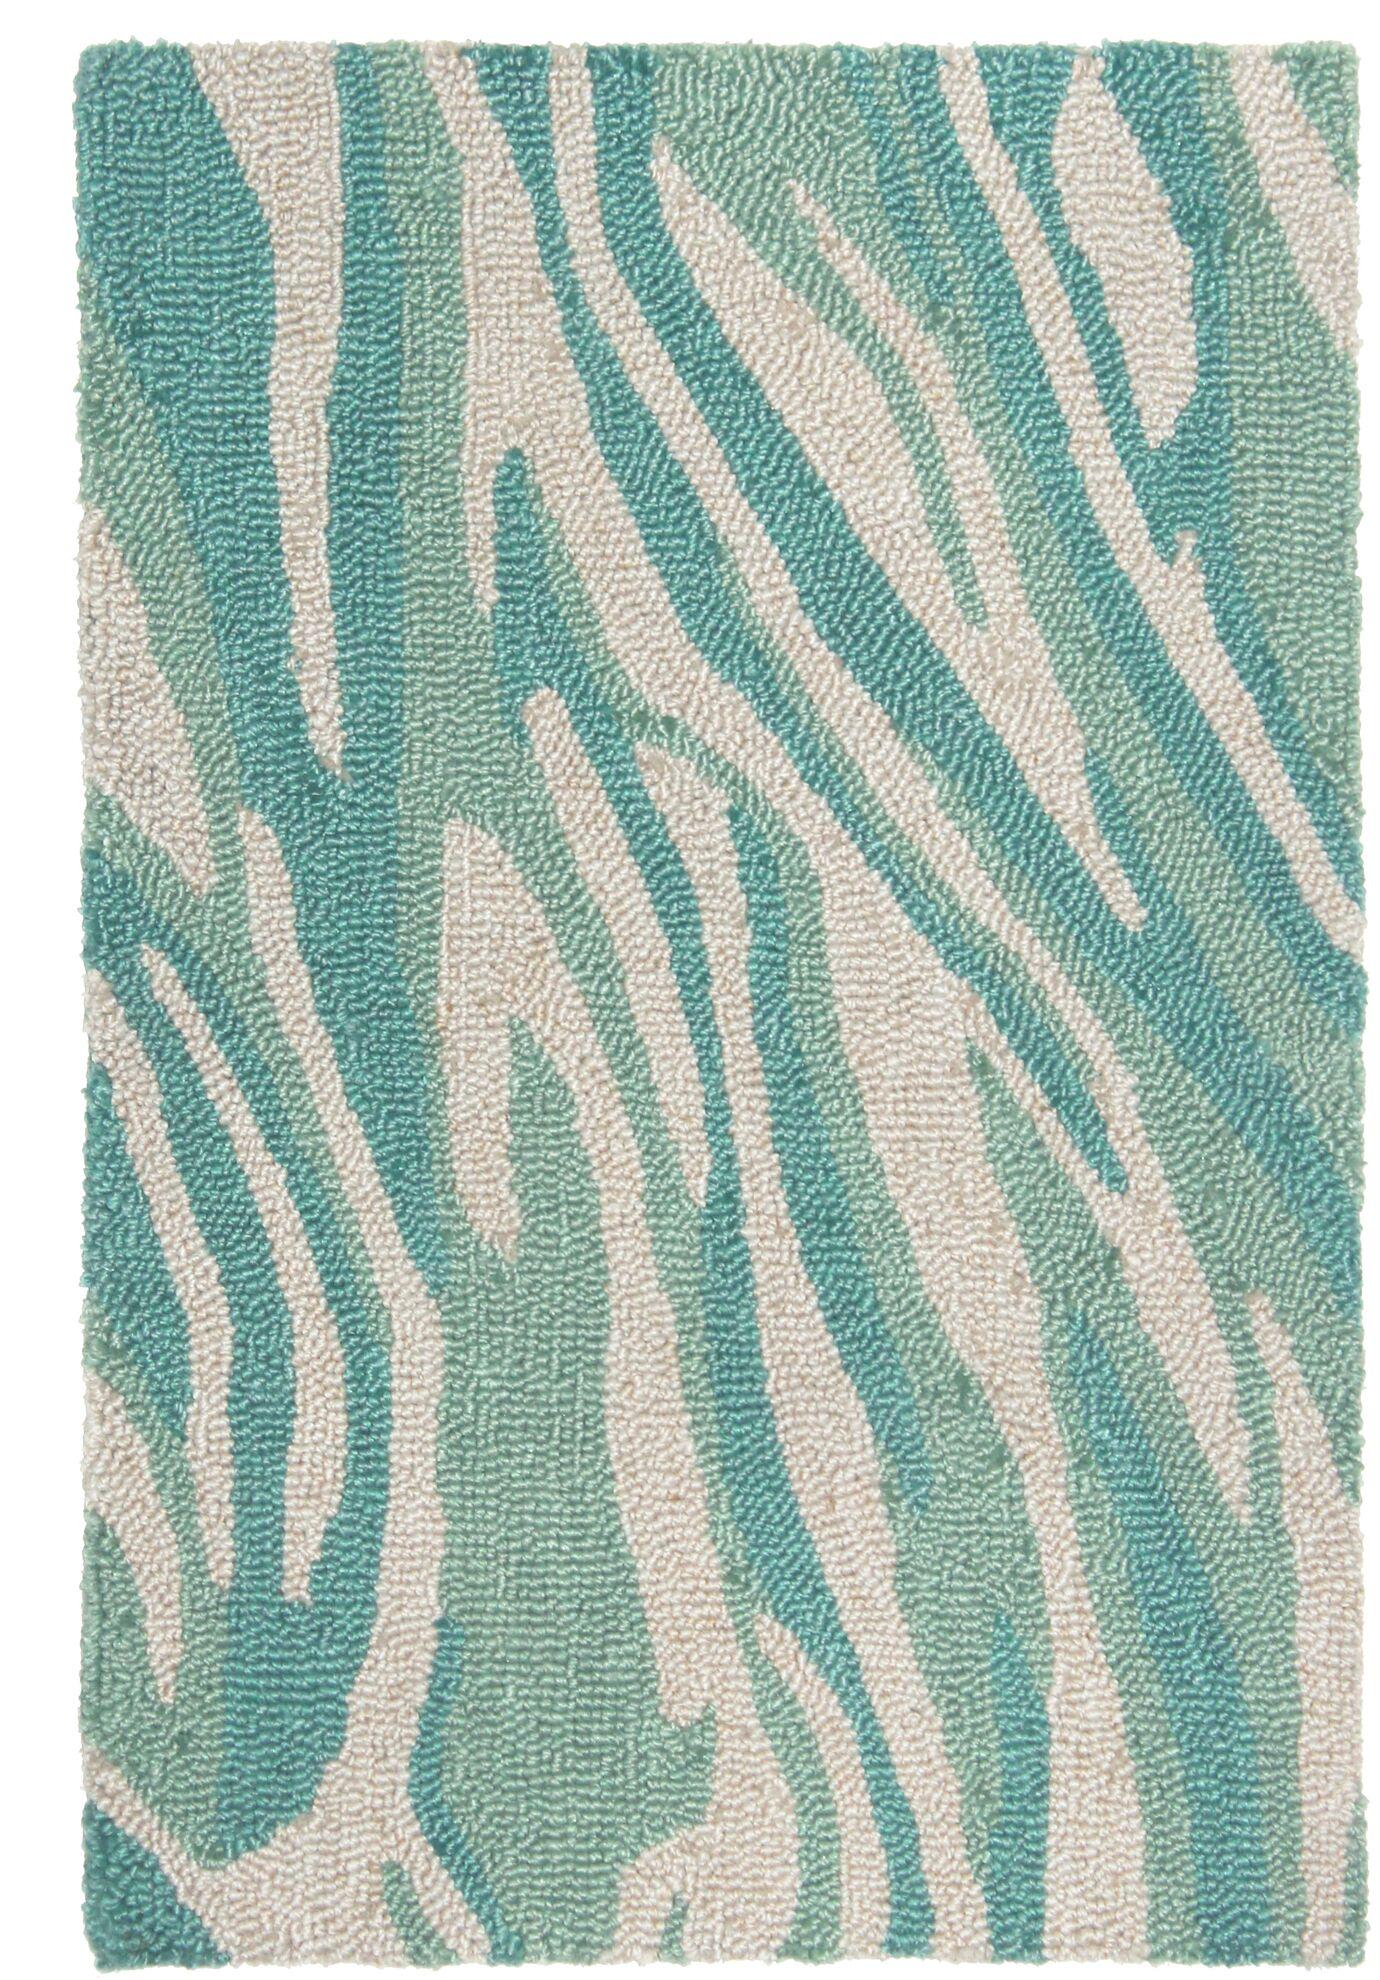 Nancee Marble Hand-Tufted Teal/Beige Area Rug Rug Size: Rectangle 3'6